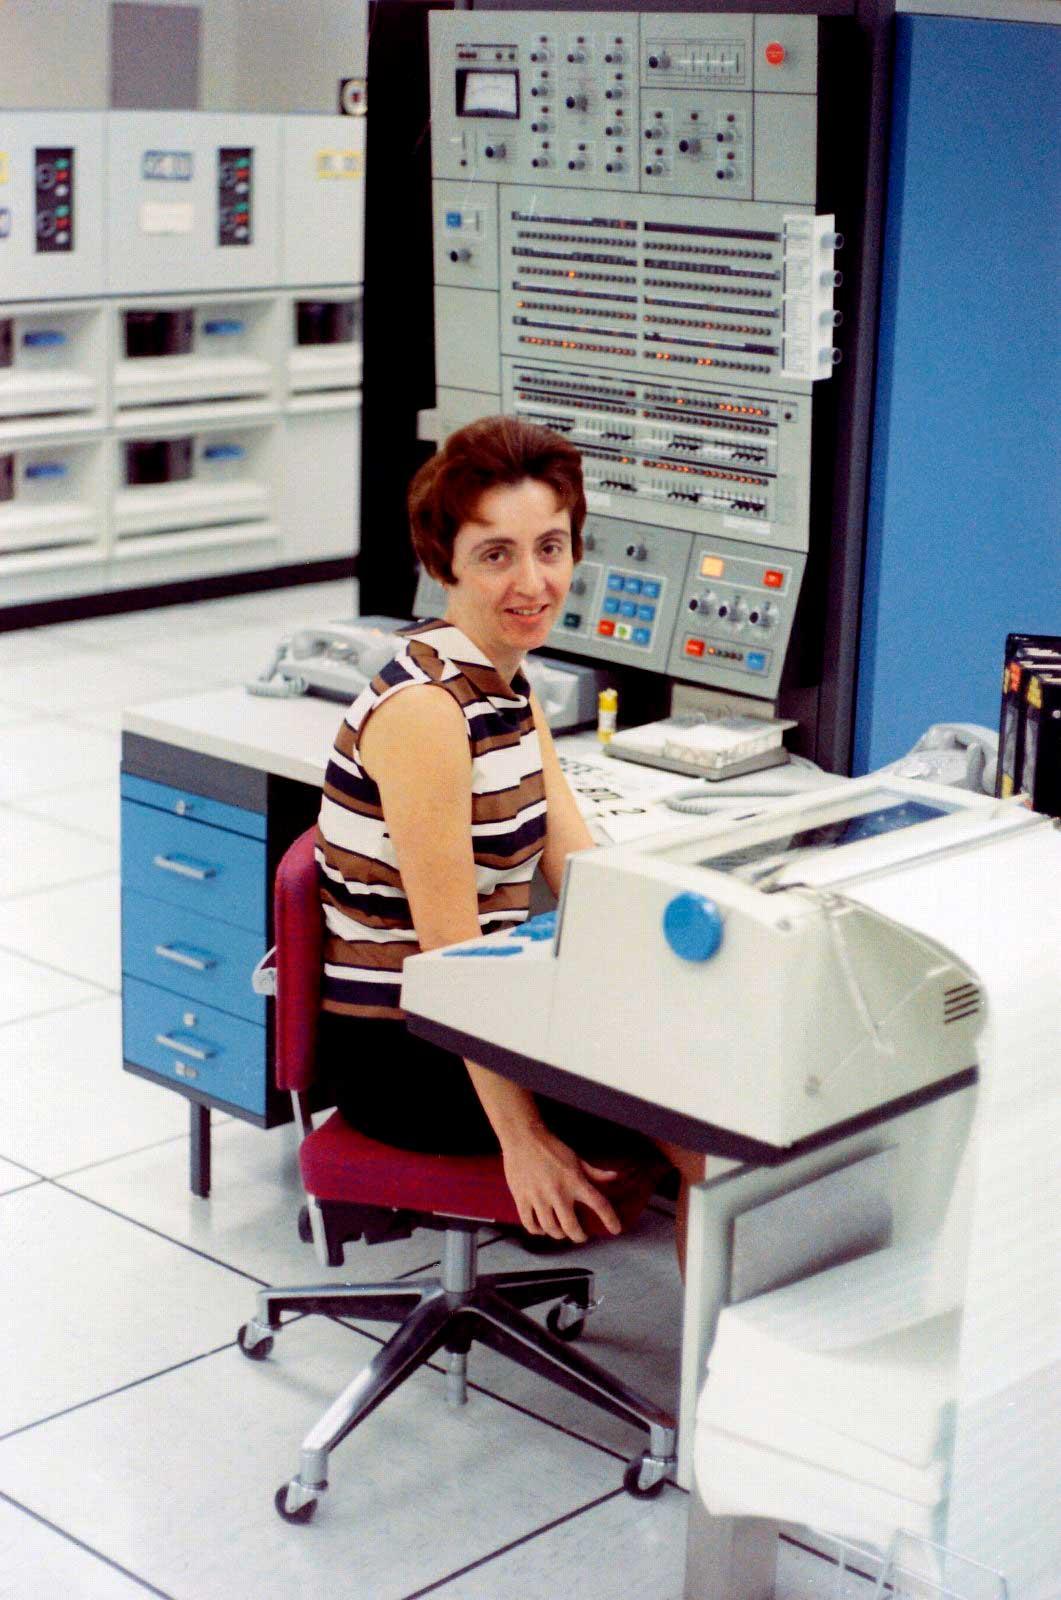 Computer Operations Supervisor